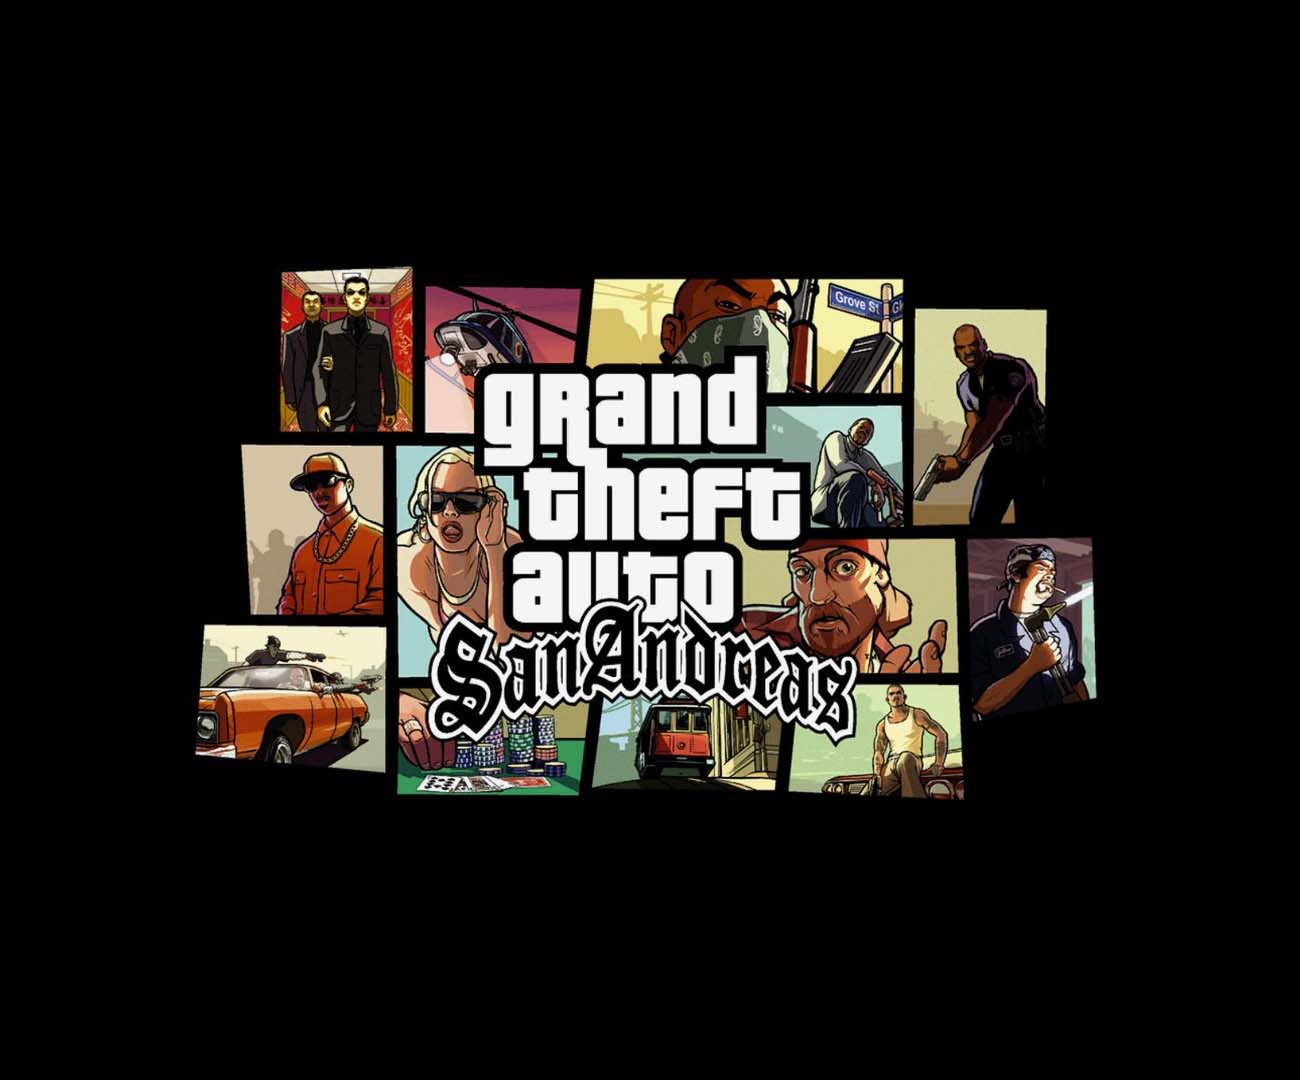 Grand Theft Auto San Andreas HD! Sztuczna inteligencja ulepszyła dawny hit